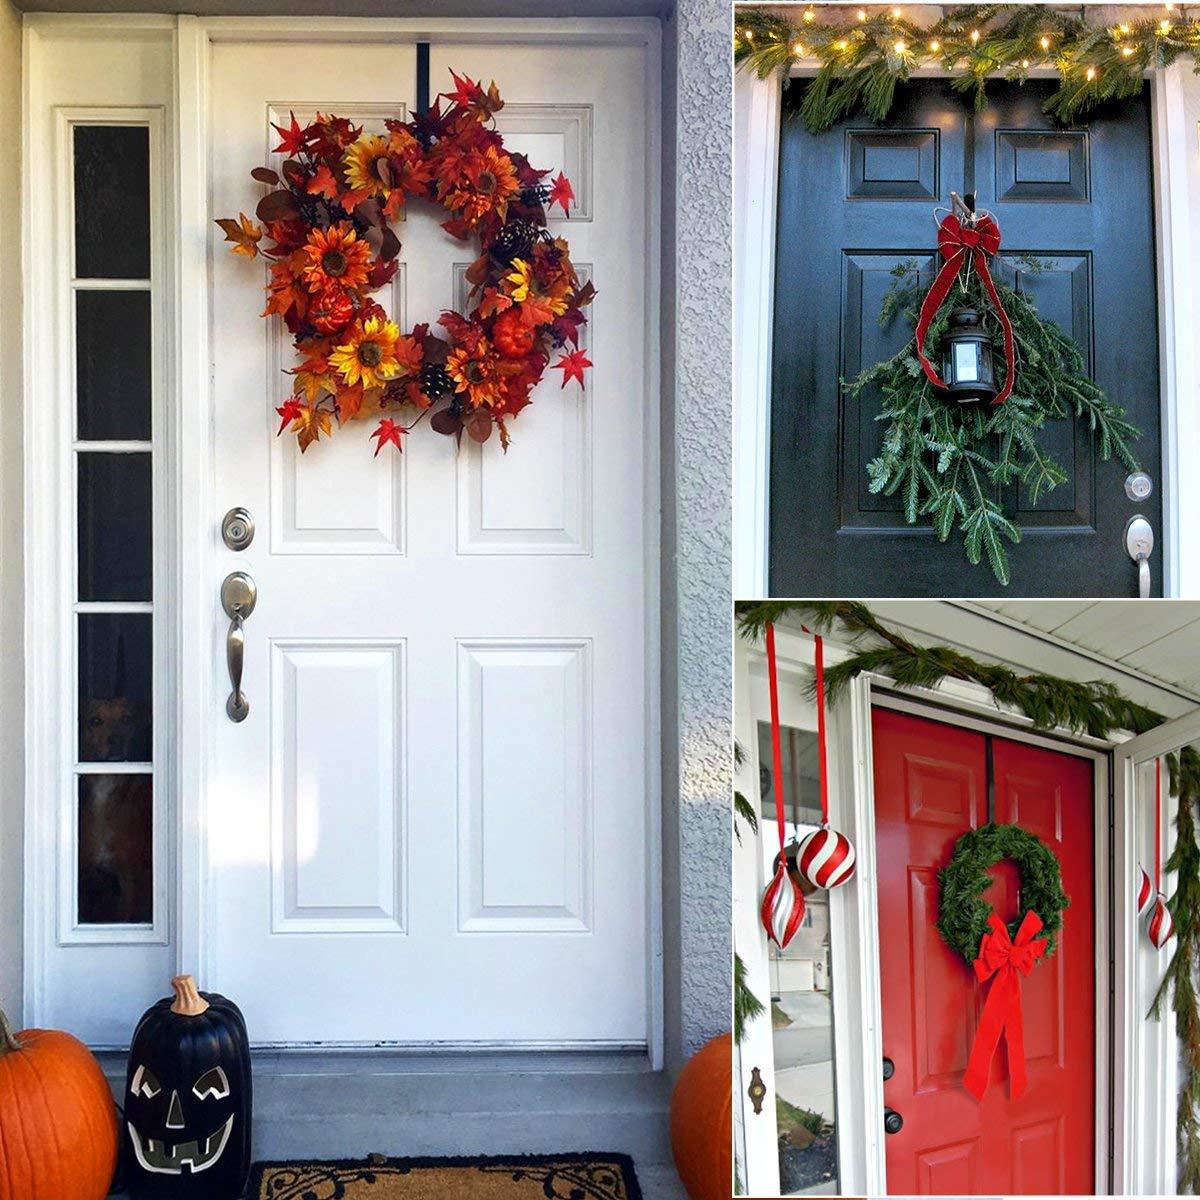 HOMEMAXS Metal Wreath Hanger Over The Door Wreath Holder 4 Packs 13.8inch Larger Wreath Metal Hook for Christmas (Black) by HOMEMAXS (Image #7)